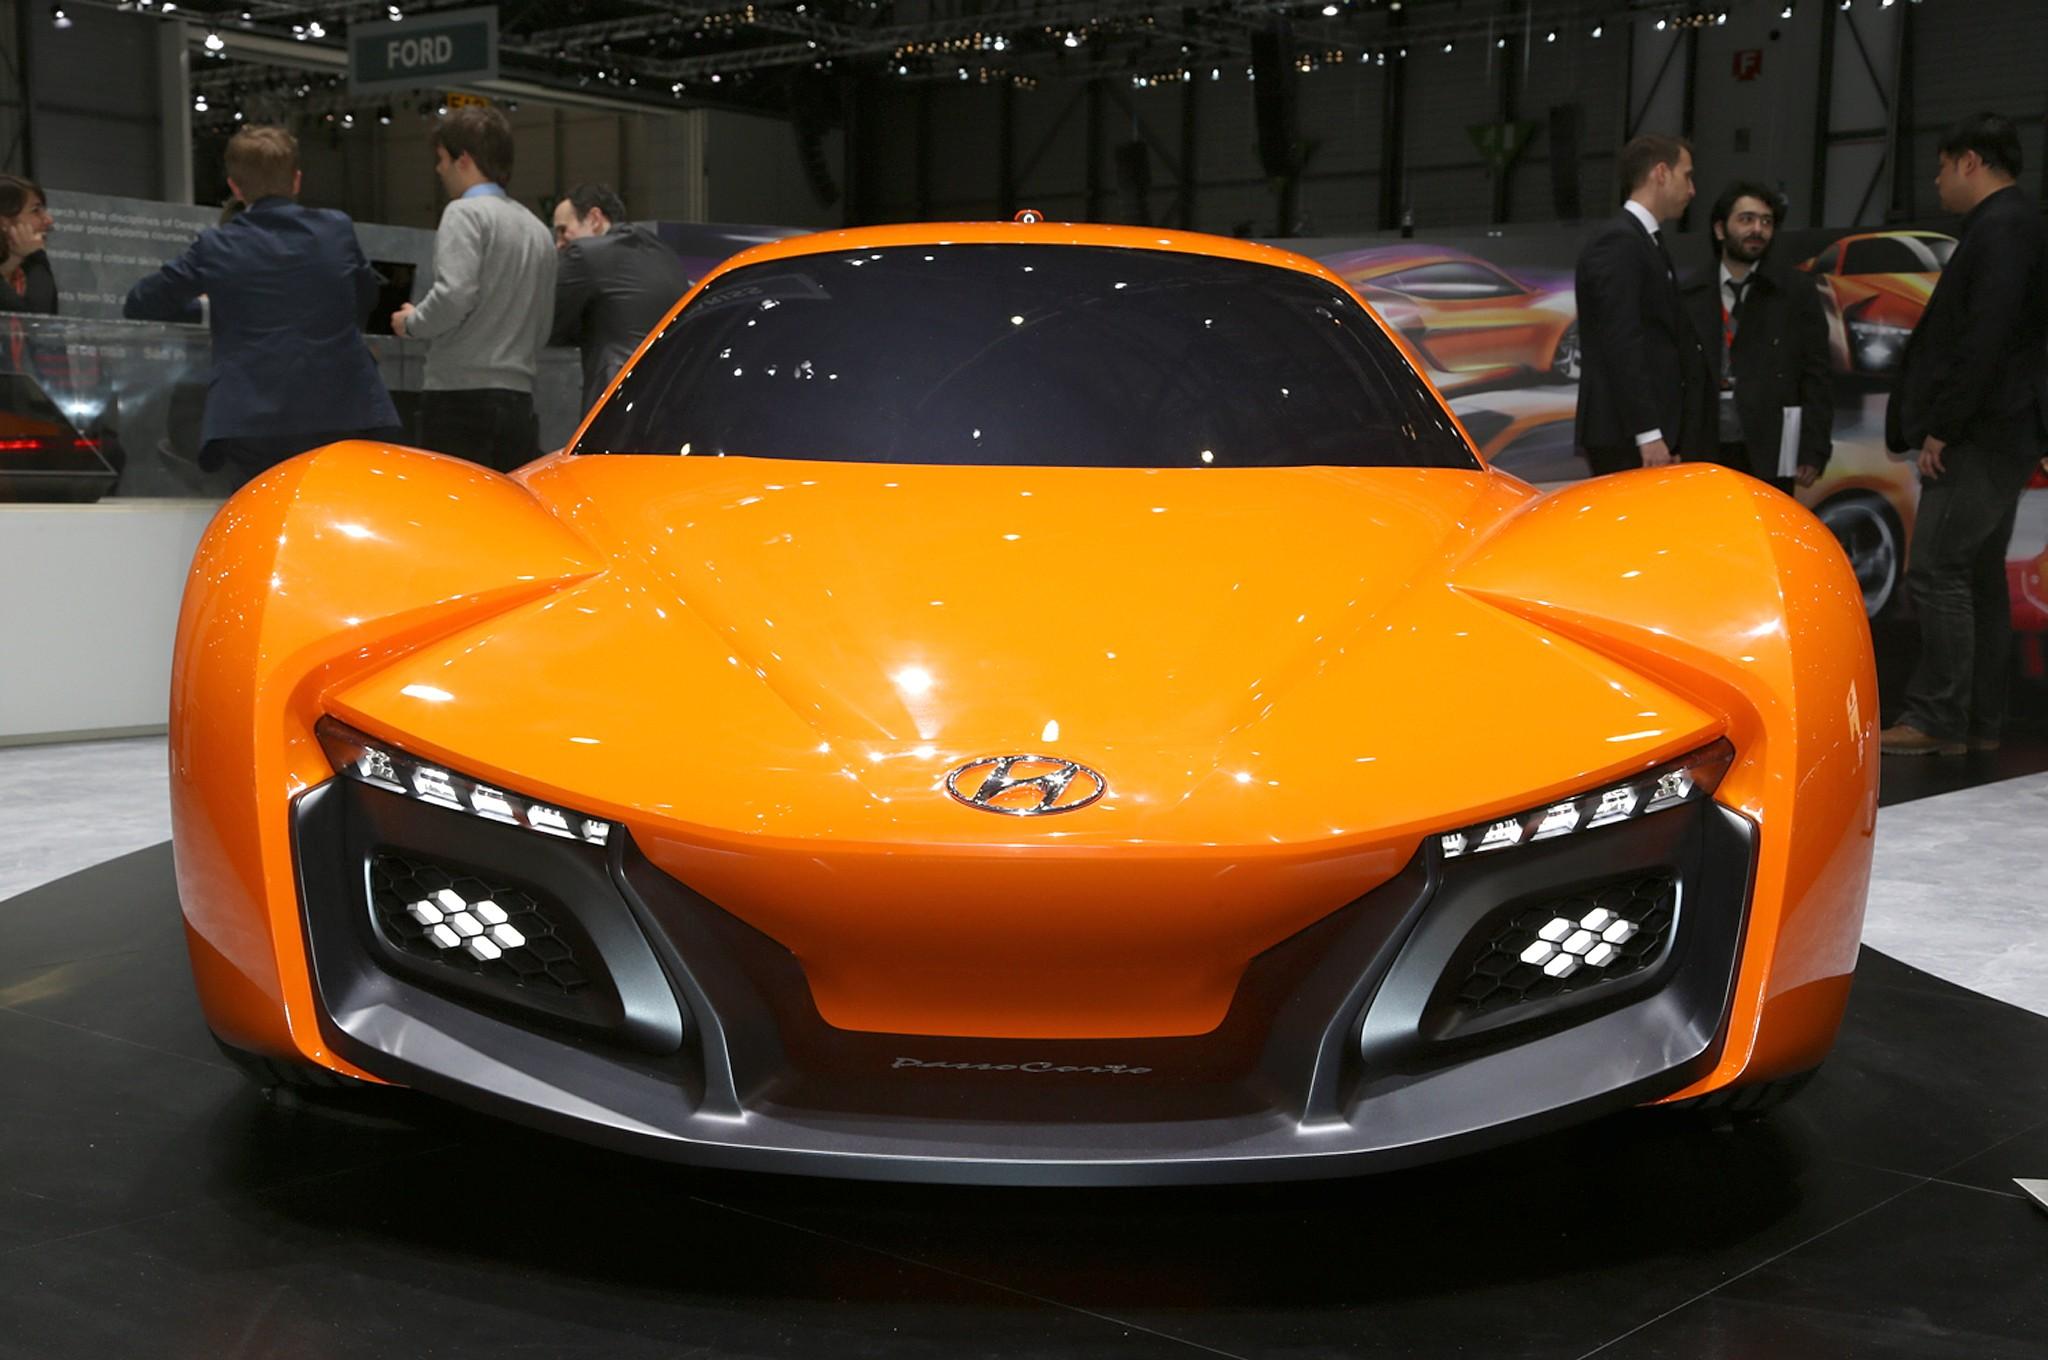 Hyndai Cars: 2014 Hyundai PassoCorto